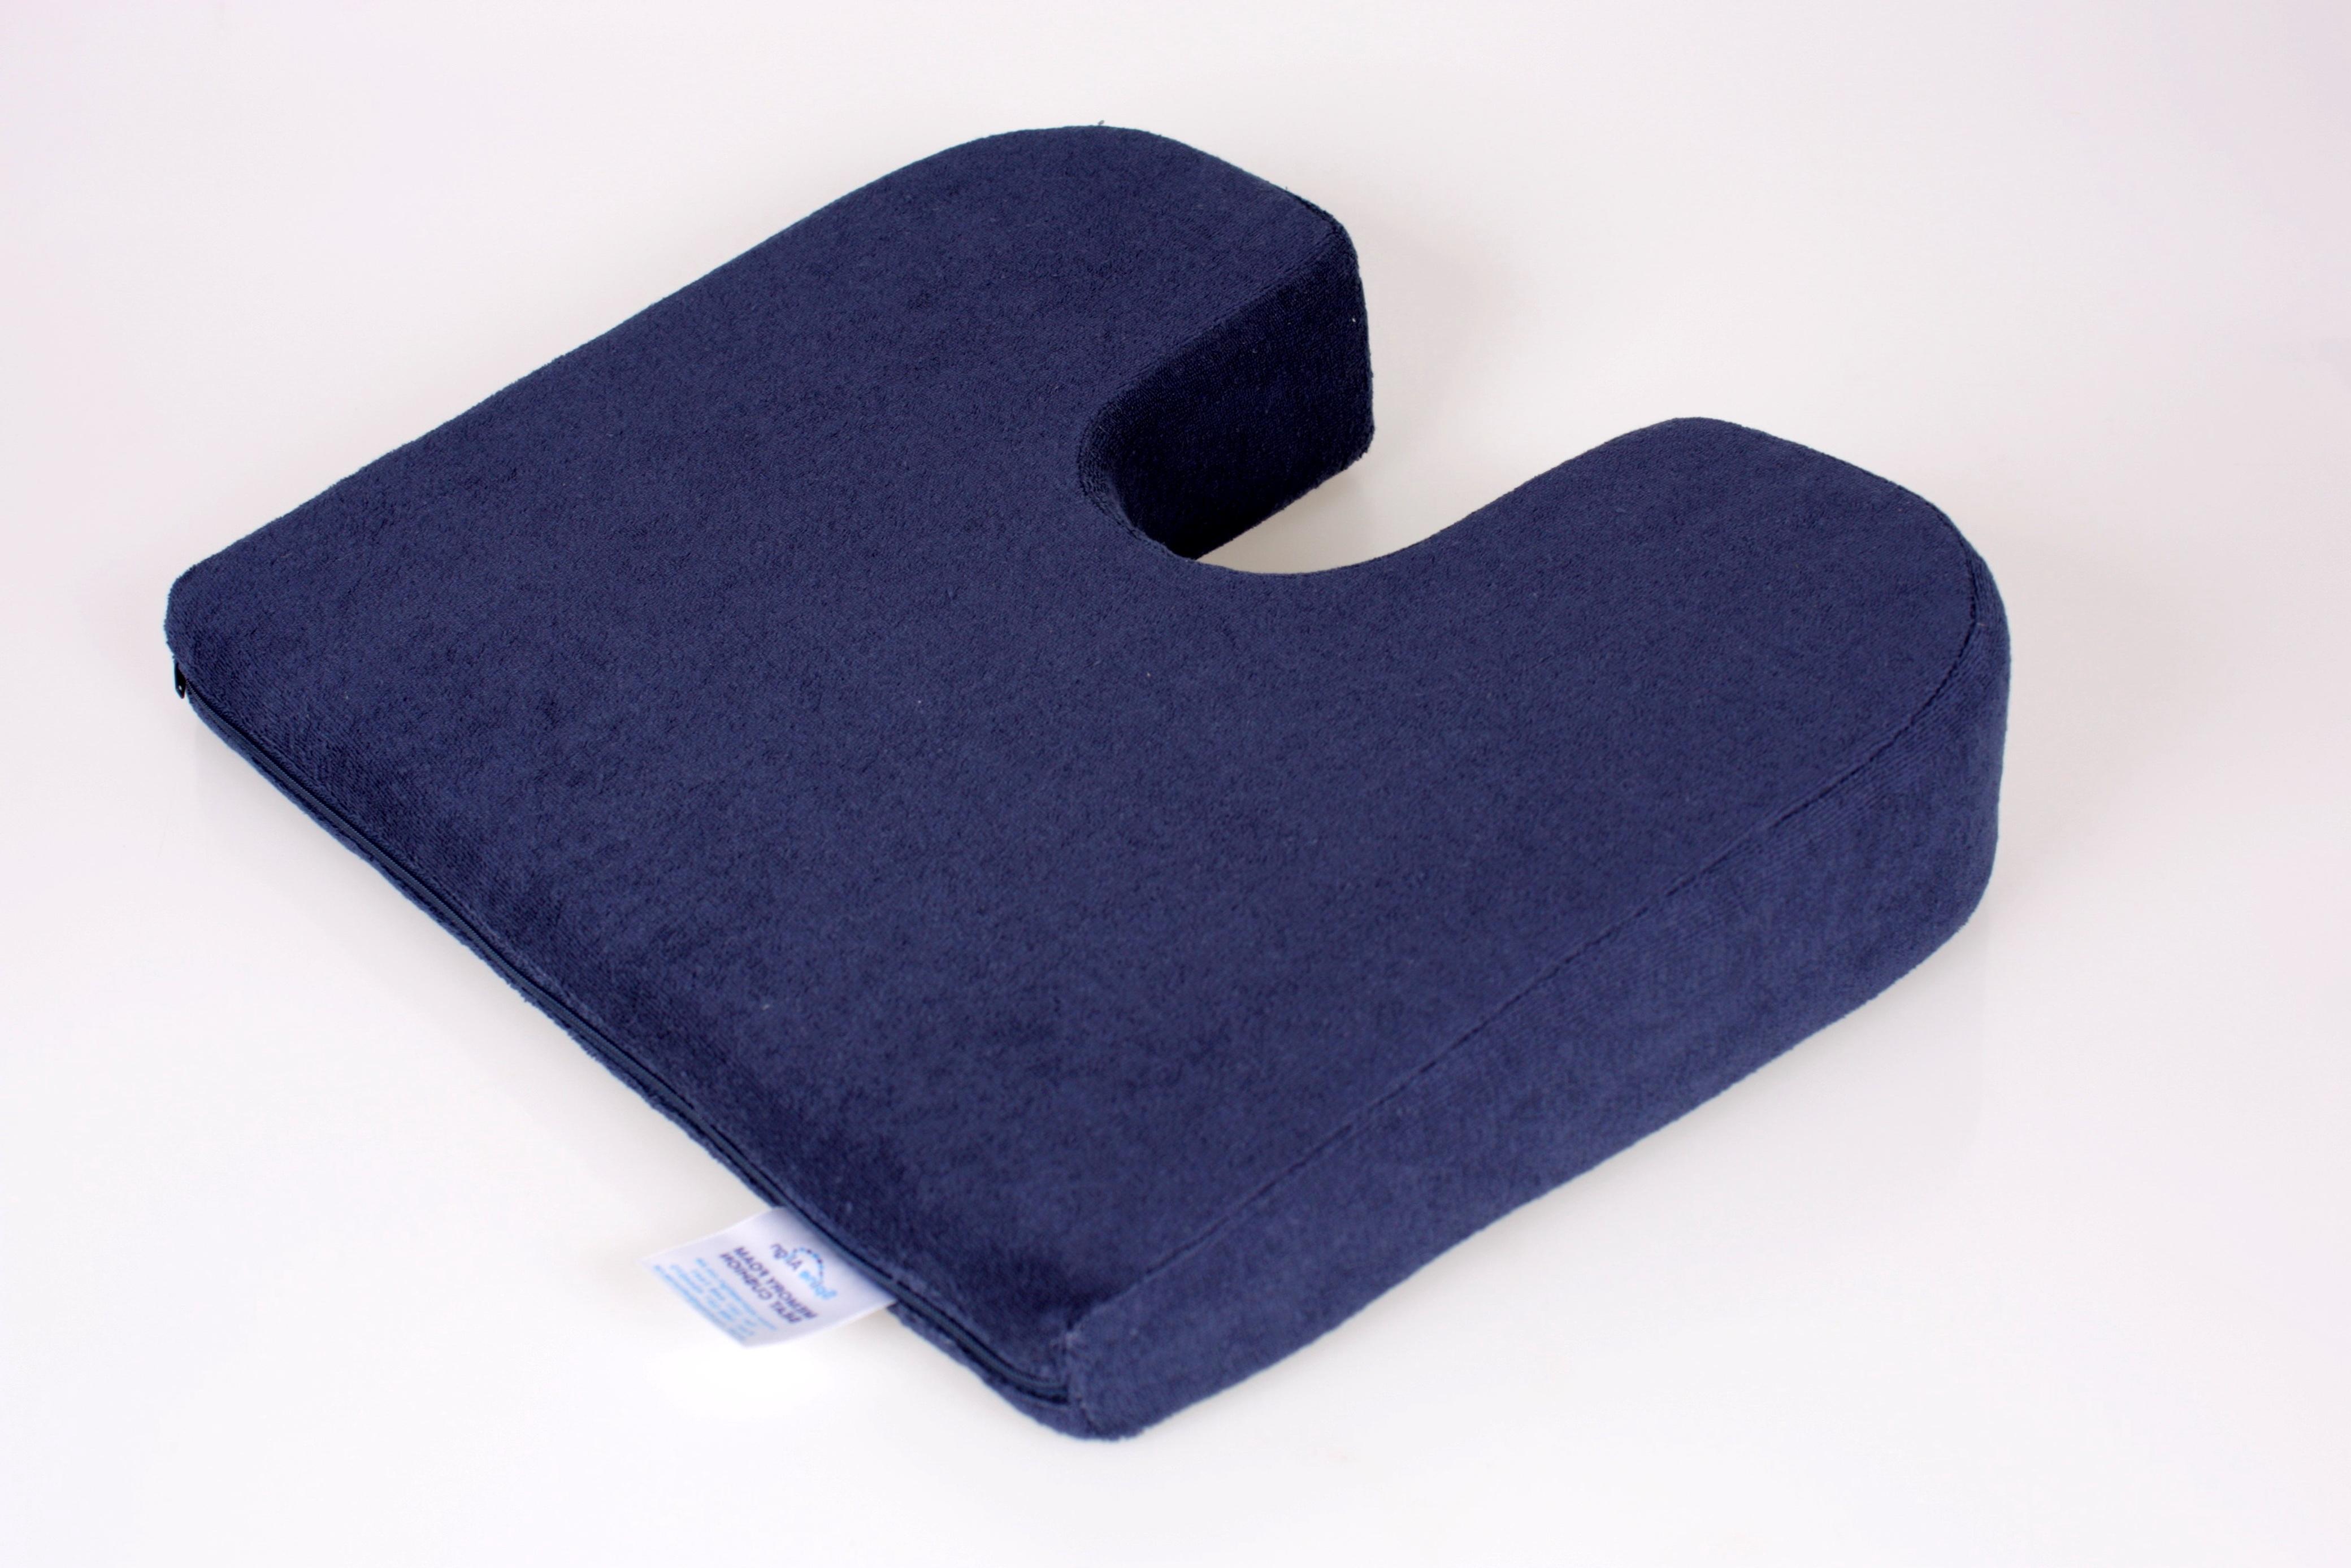 Hemorrhoid Seat Cushion Walmart